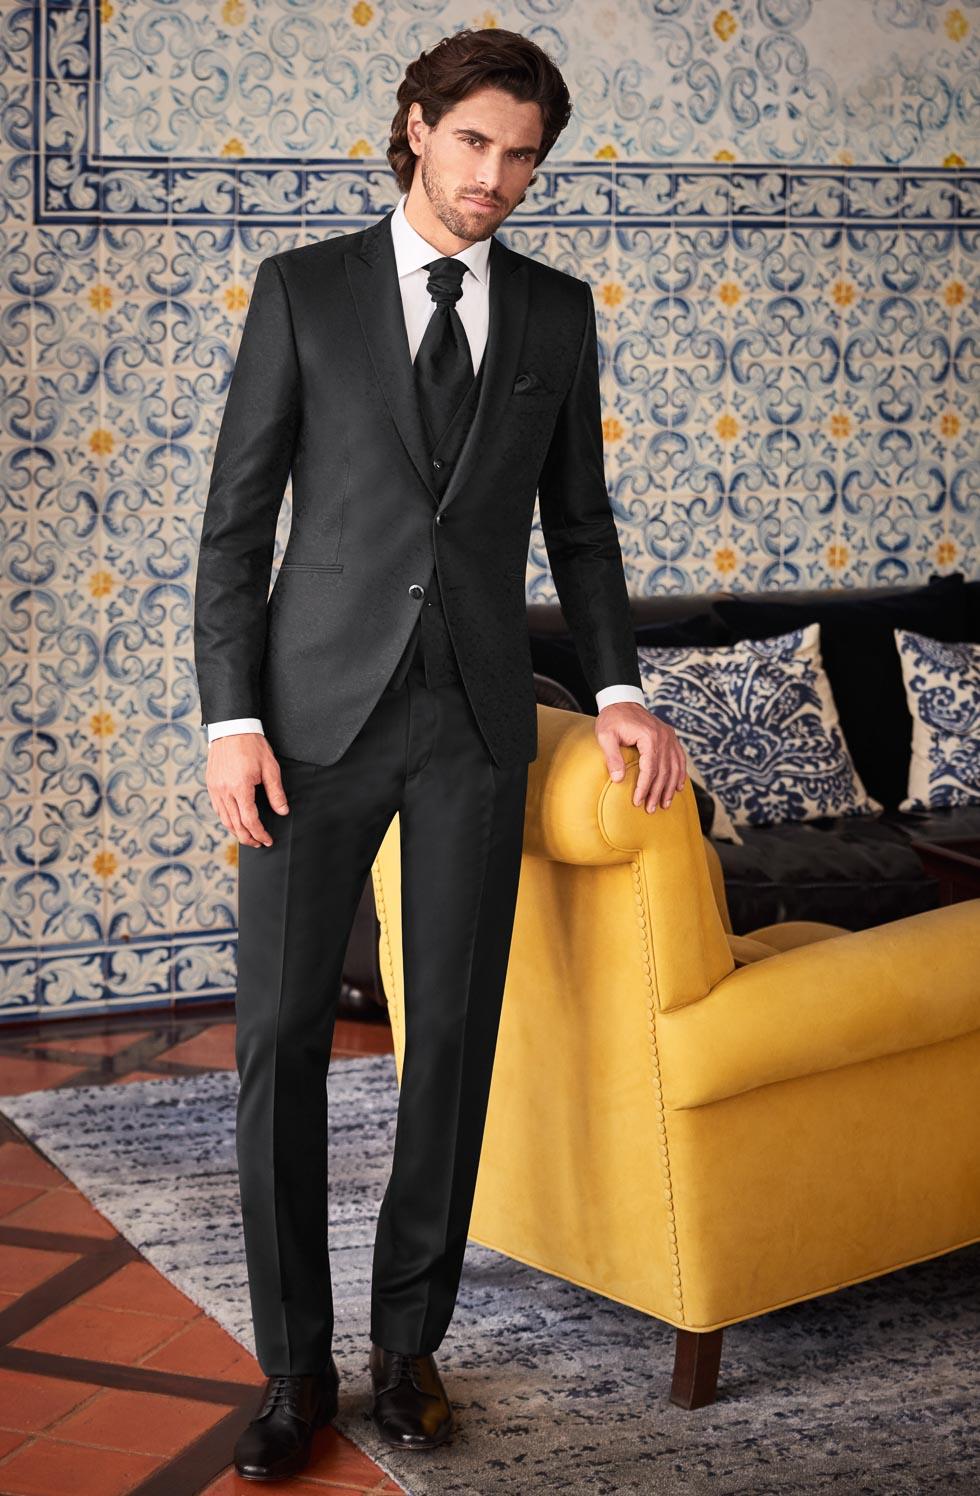 der anzug f r den br utigam von wilvorst weddingstyle. Black Bedroom Furniture Sets. Home Design Ideas